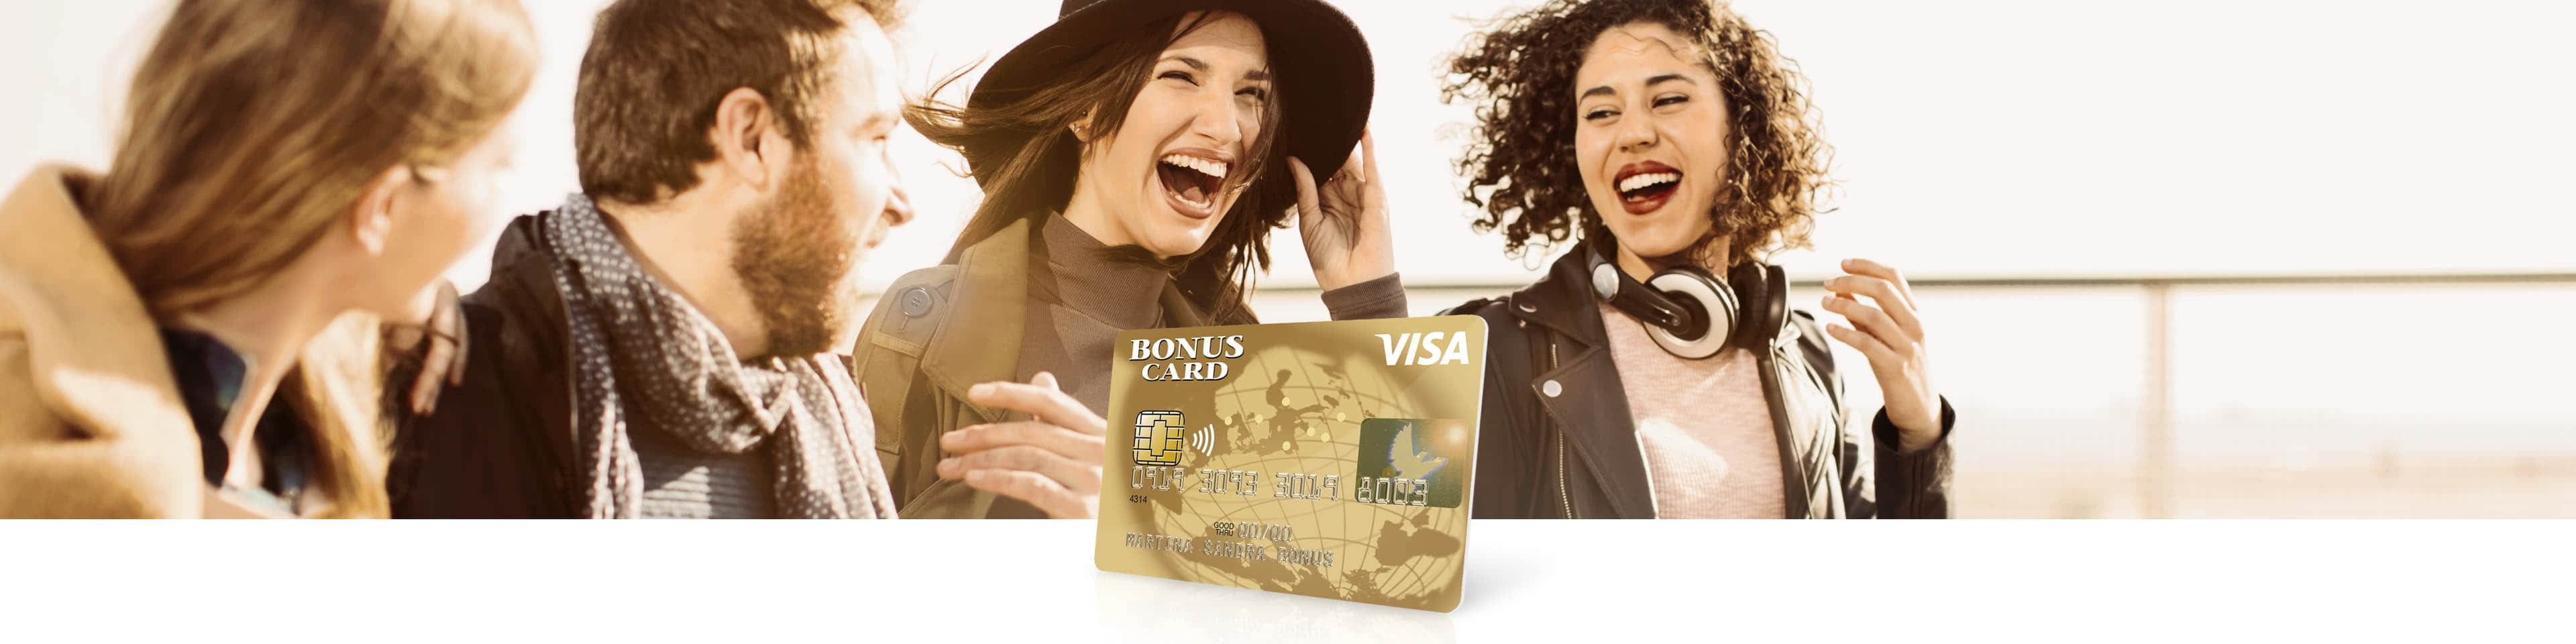 Visa Bonus Card Classic Prepaid